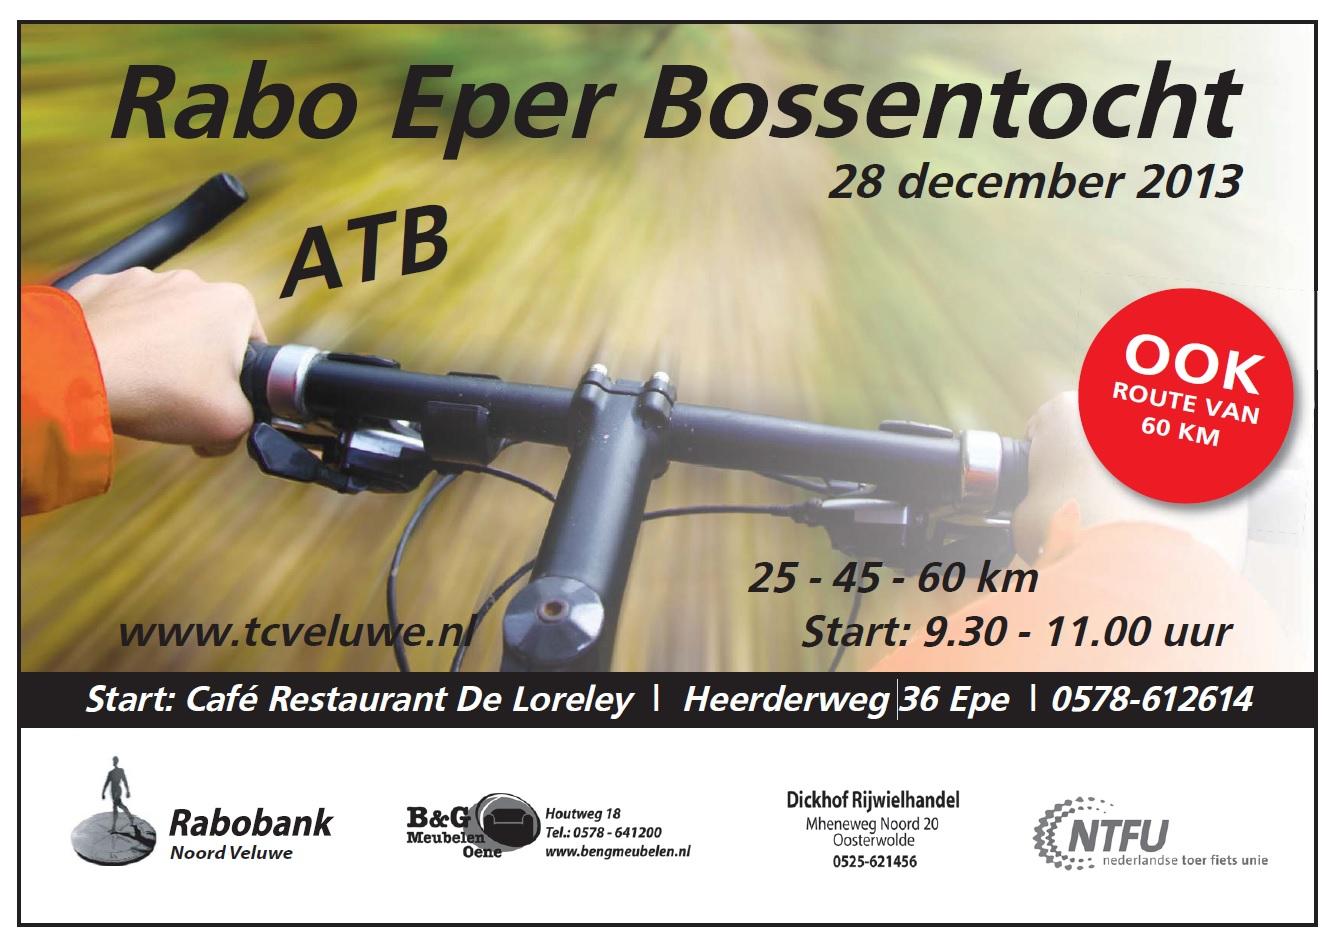 http://www.tcveluwe.nl/wp-content/uploads/2013/12/poster-dec-13.jpg